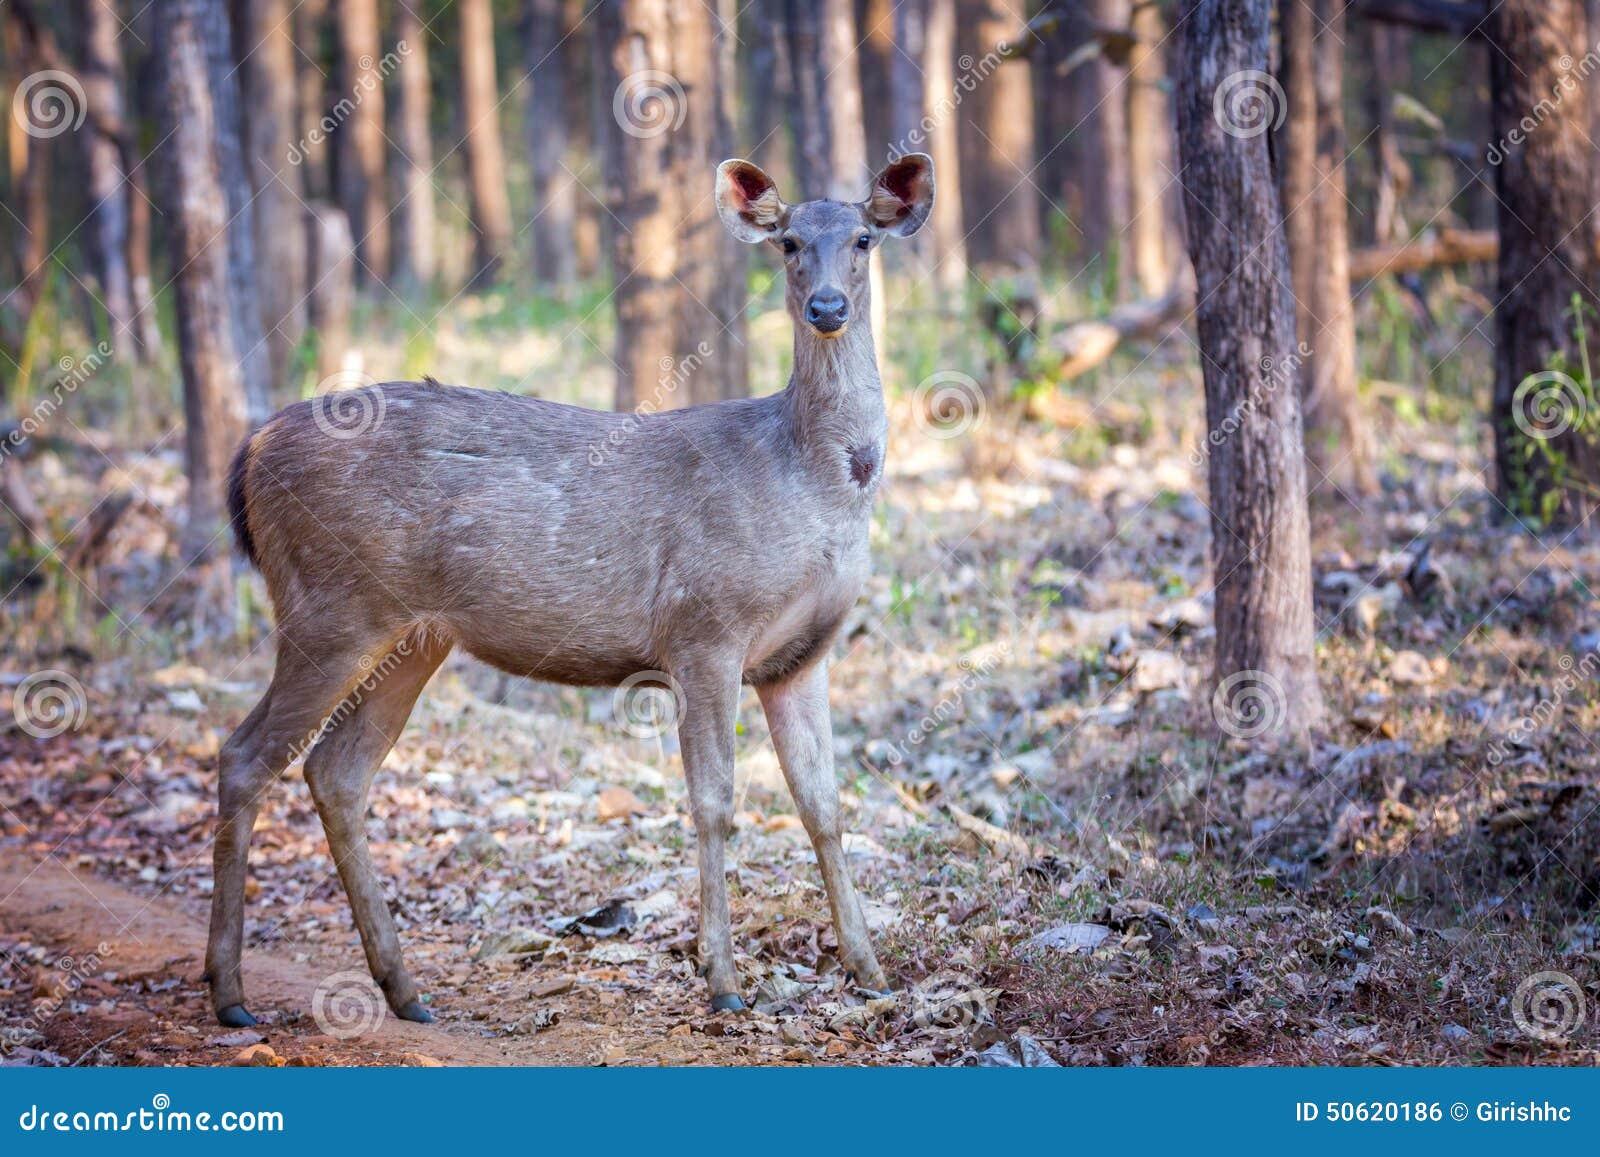 Sambar Deer With Habitat Stock Photo Image Of 450mm 50620186